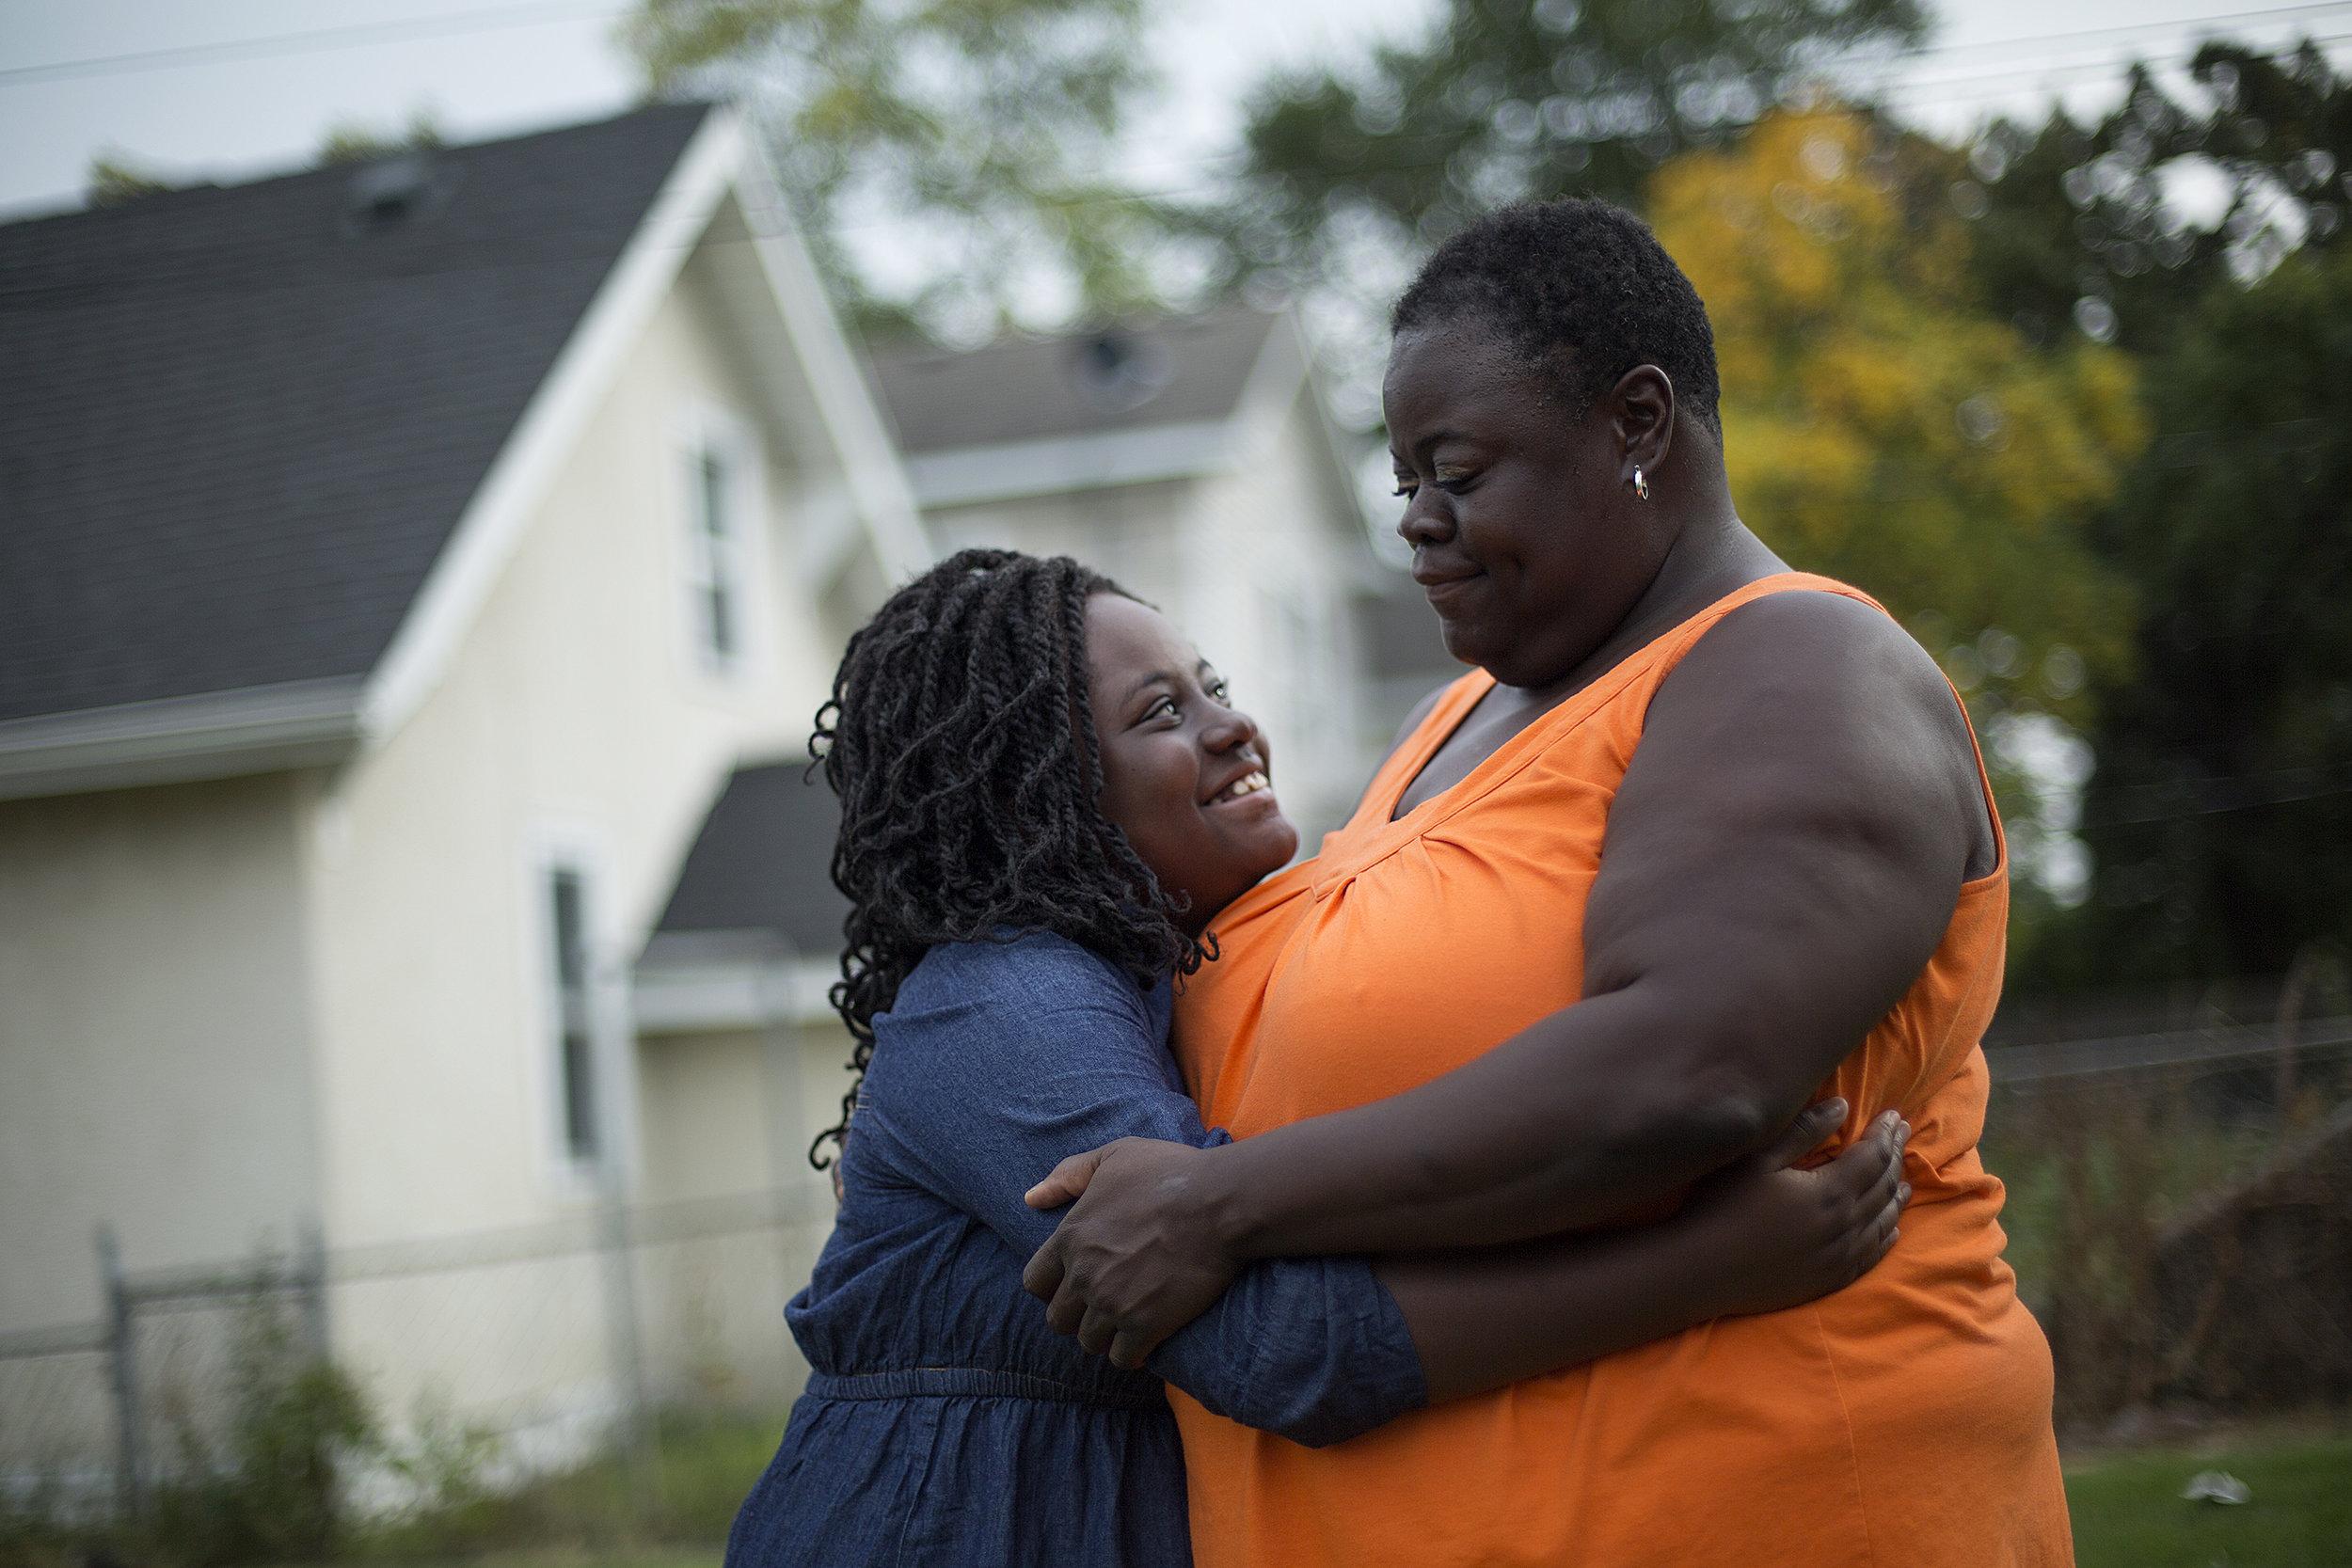 Ticiea Fletcher stands in her backyard with her daughter, Logan Jessica, 10. They live in the Jordan neighborhood of North Minneapolis.